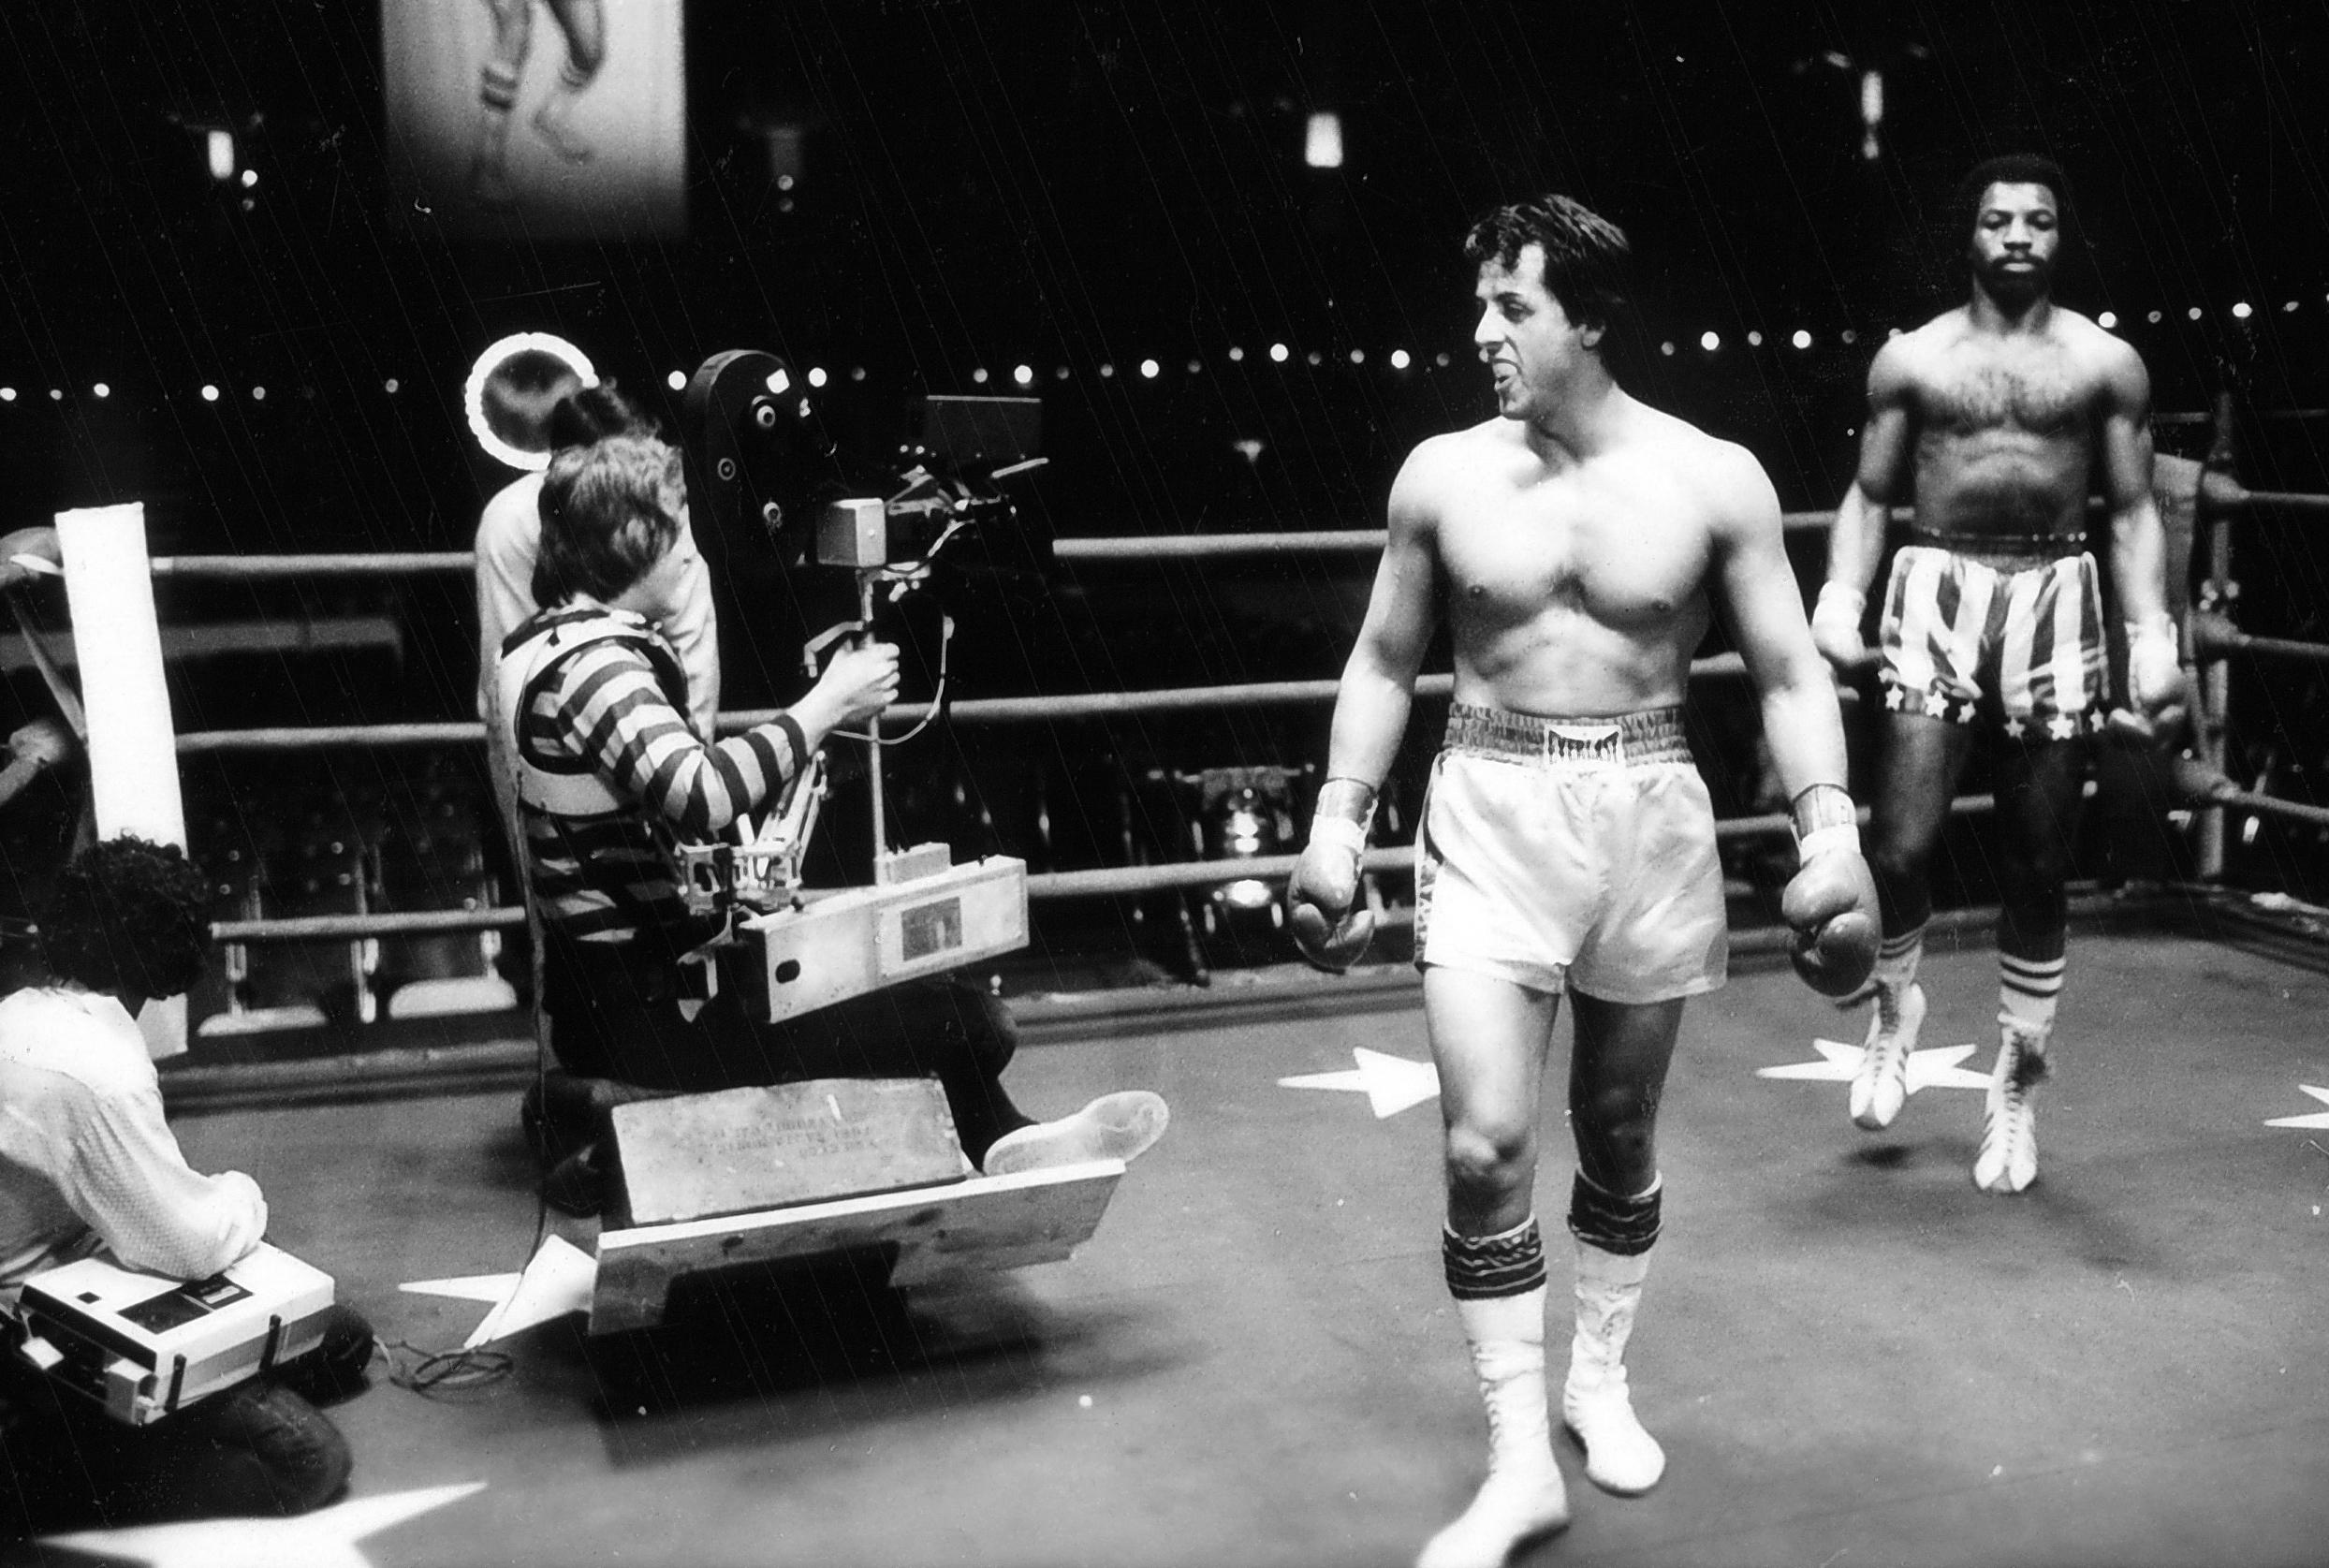 Rocky': A Heartwarming Sports Drama Reflecting Its Very Process of ...